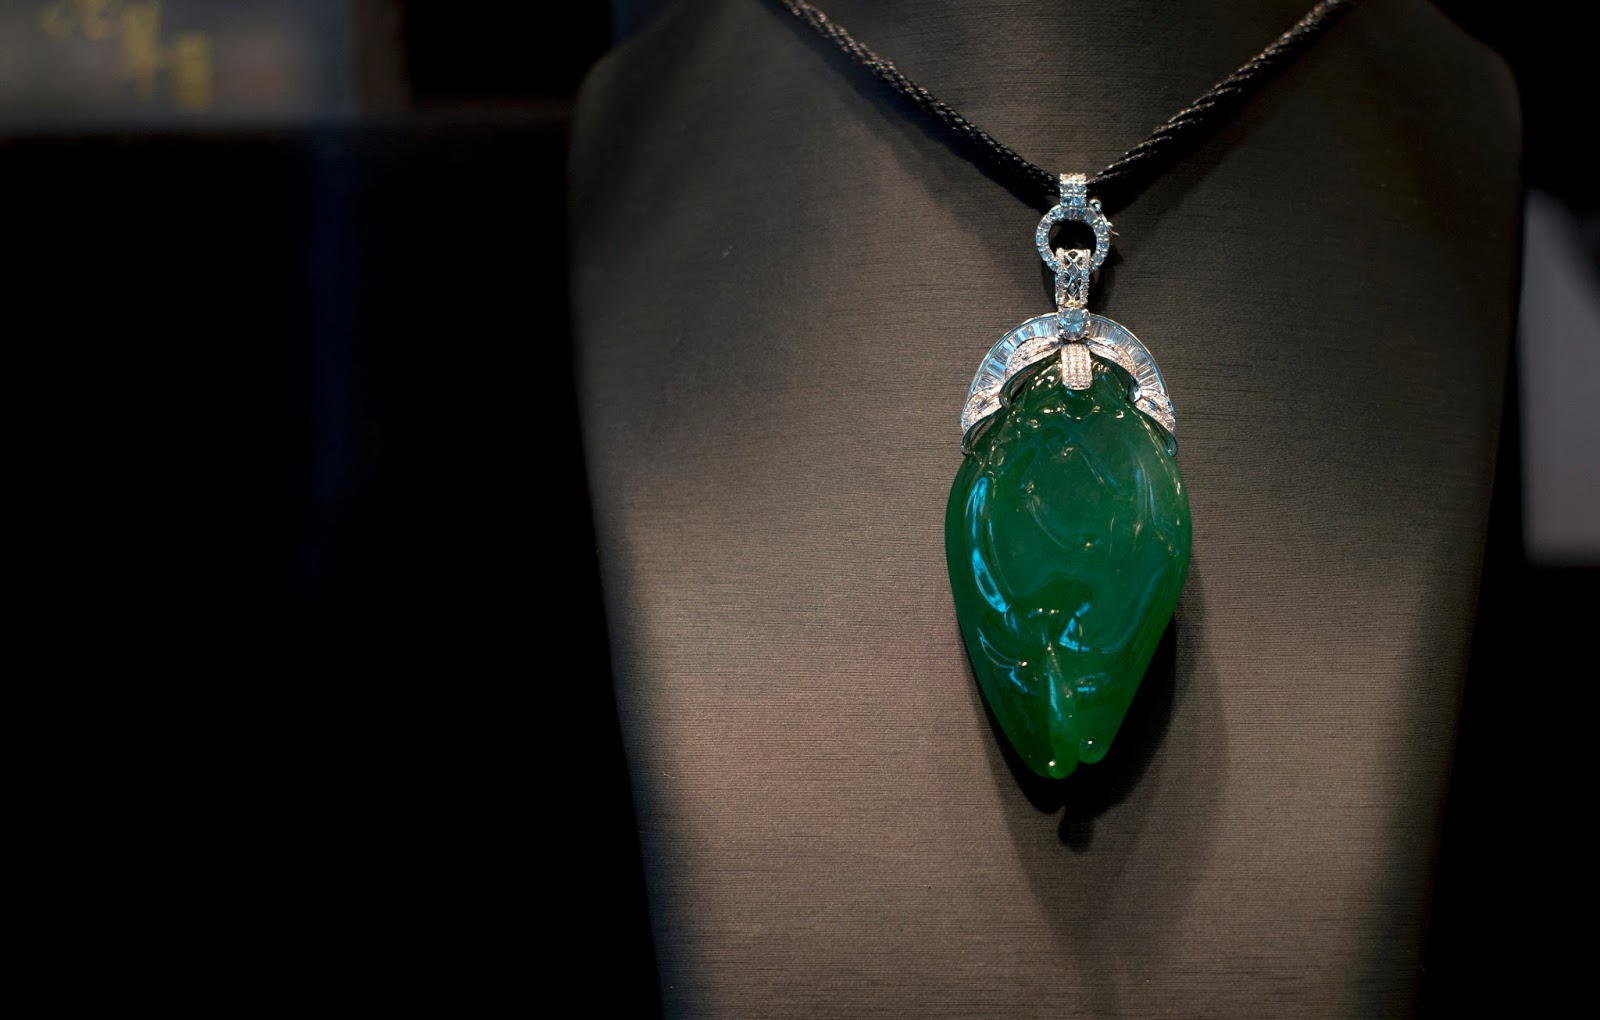 Asia, Business, China, Diamond, Economy, Exhibition, Gem Fair, Gems, Hong Kong, Jade, Jewellery, Jewellery Show, Myanmar, Pearls, Rubies, Stone, Trade Fair, Trade Show,